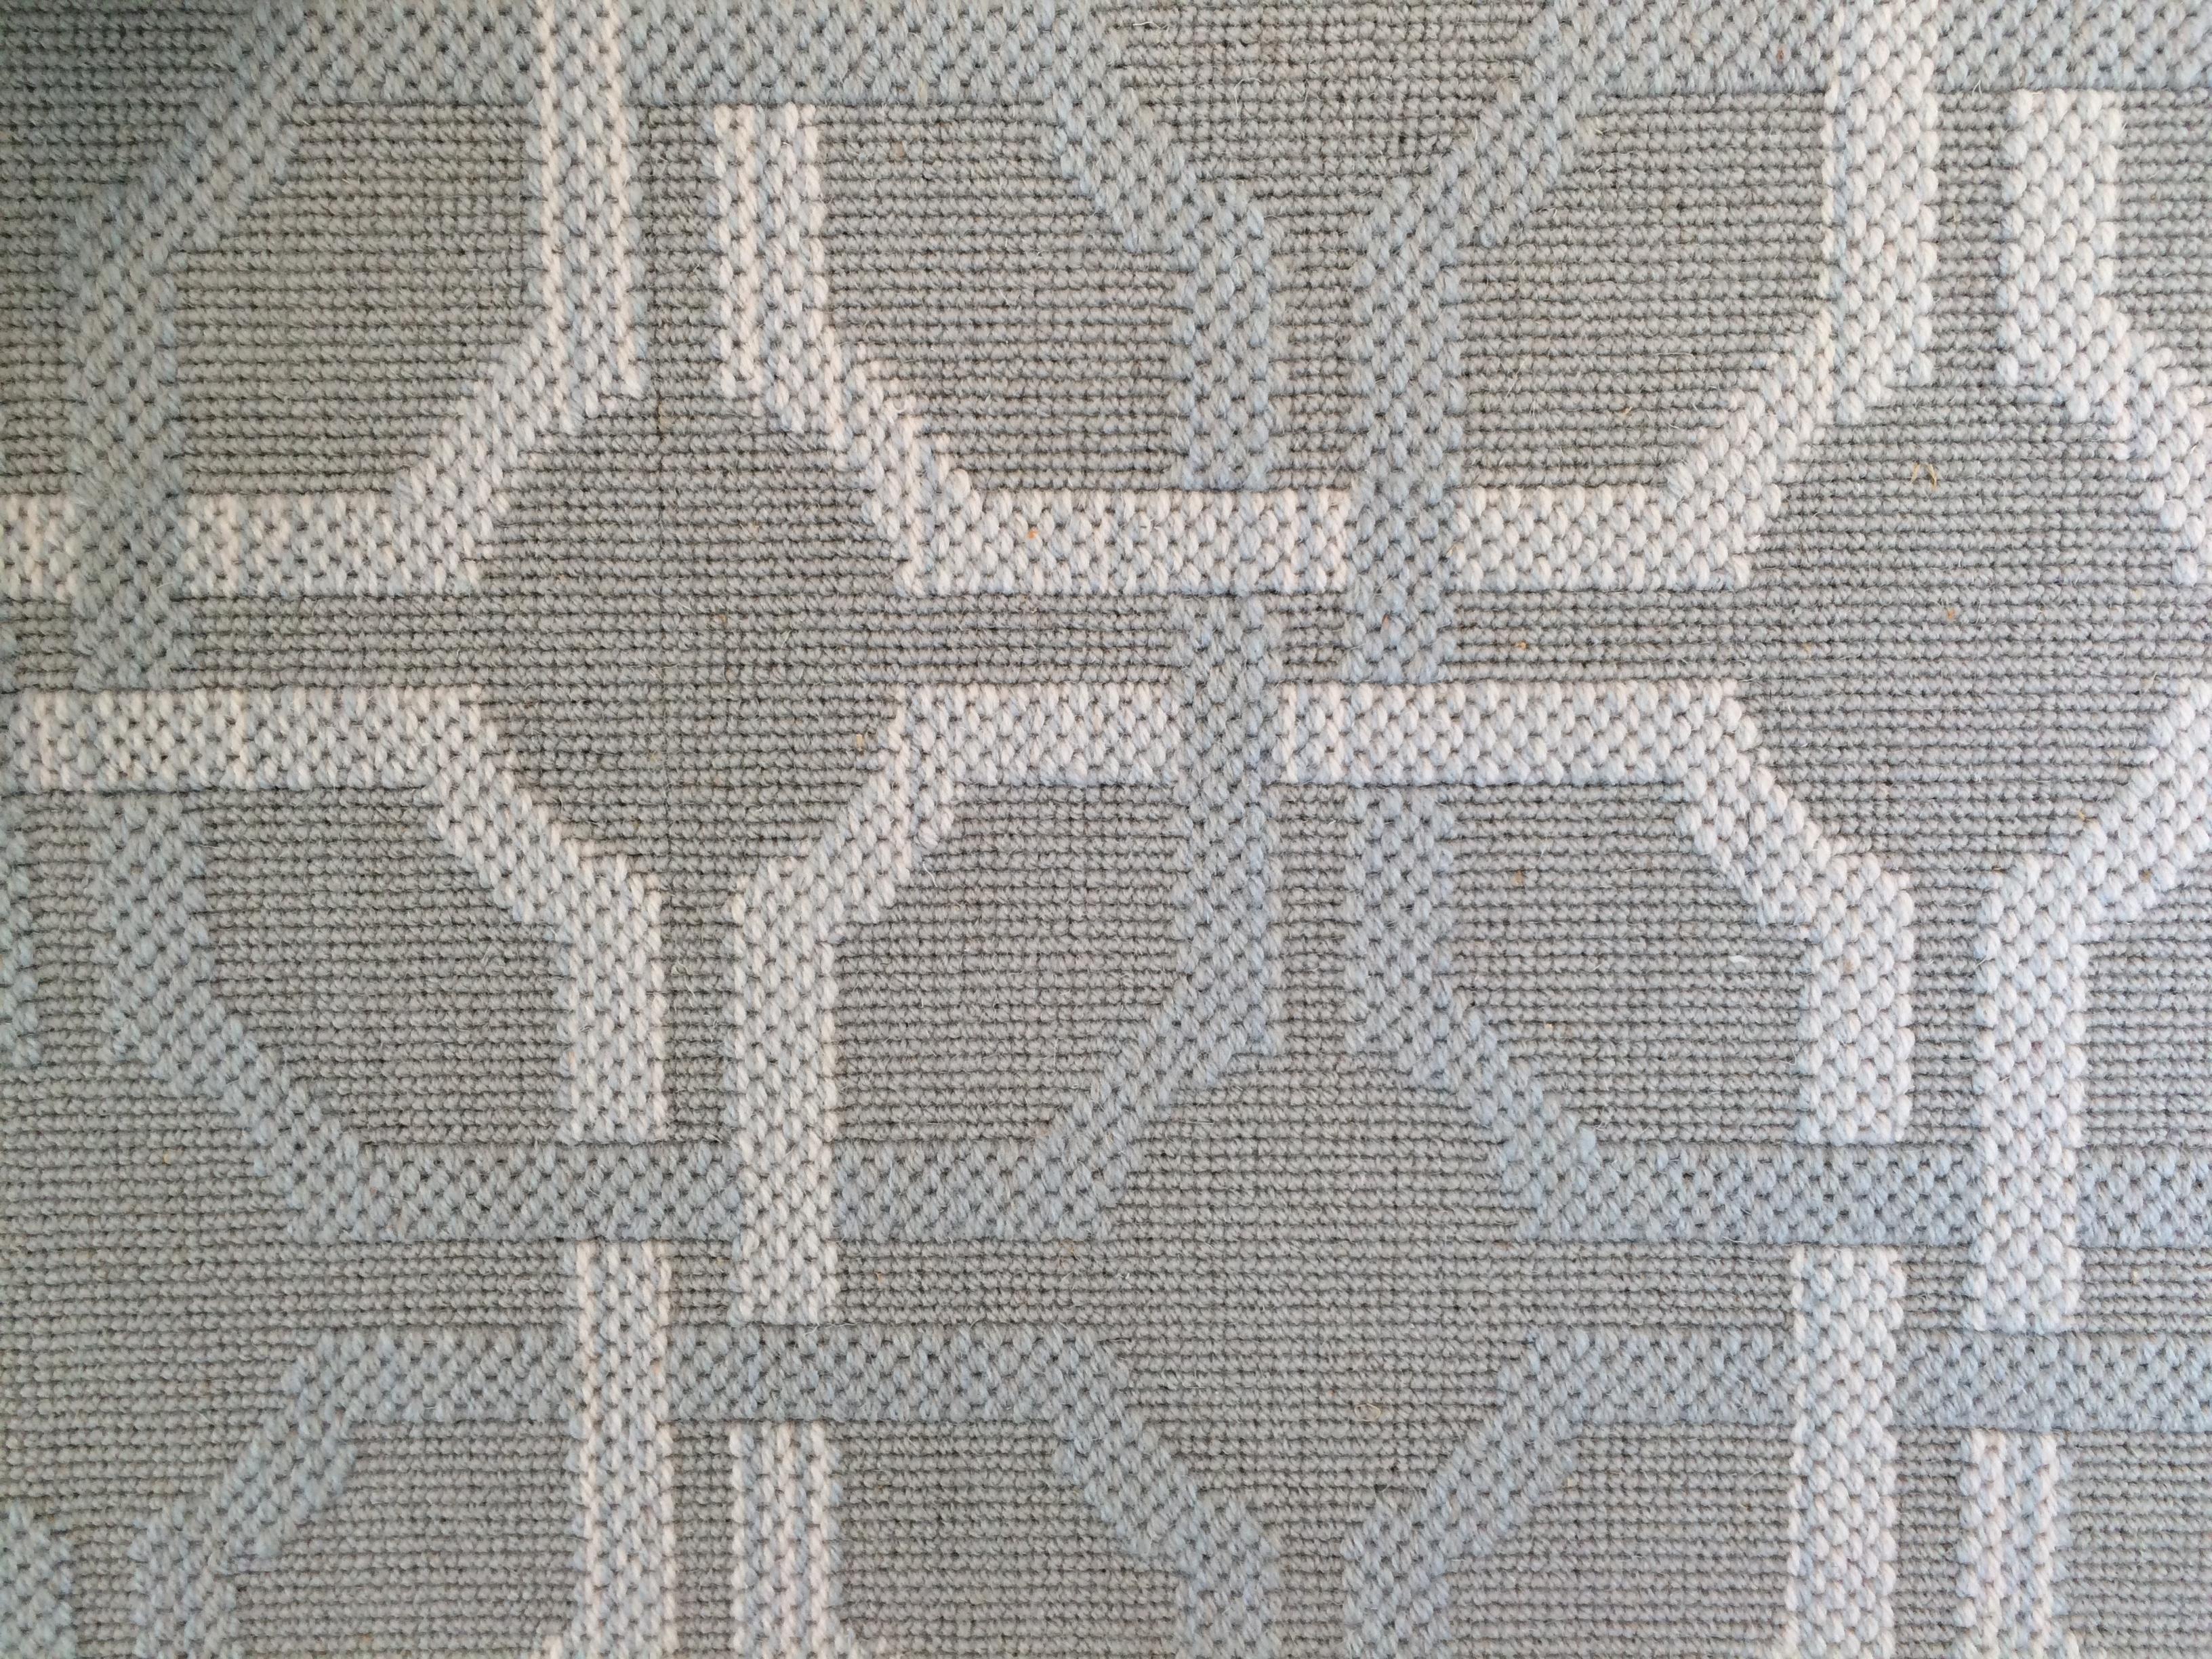 Broadloom Carpet Or Wall To Wall Abbey Carpet Of San